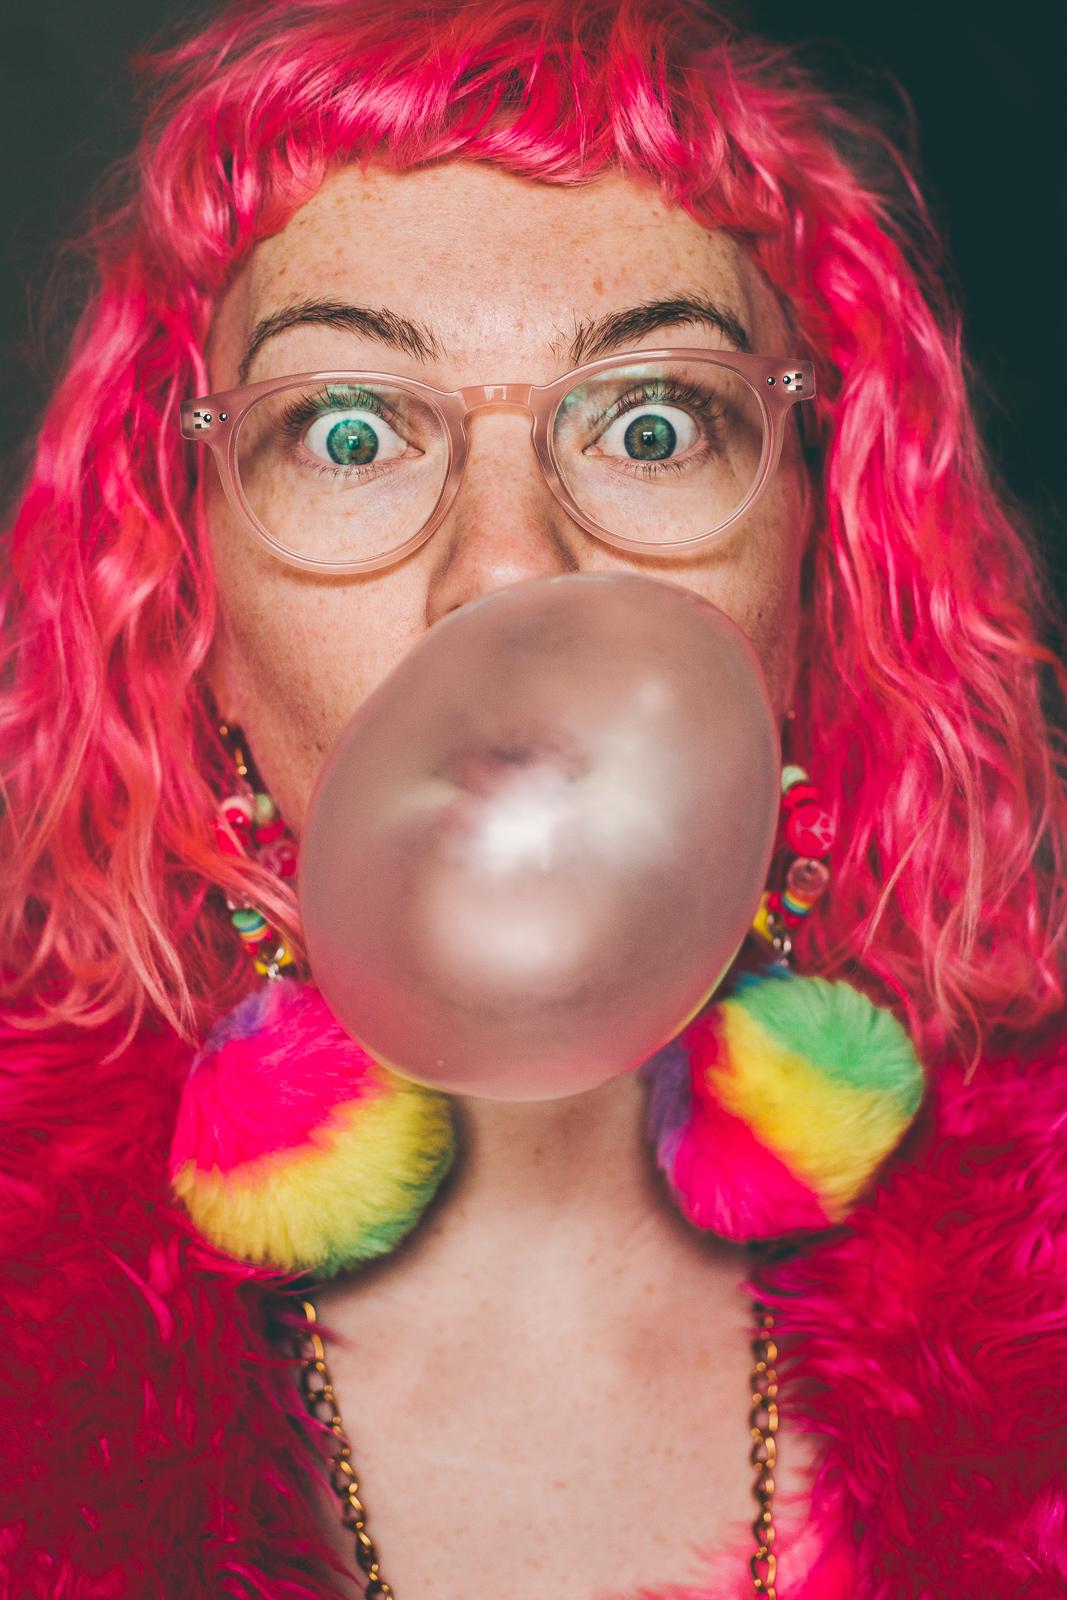 2019_RebeccaRuetten_Web_RainbowPride-4.jpg